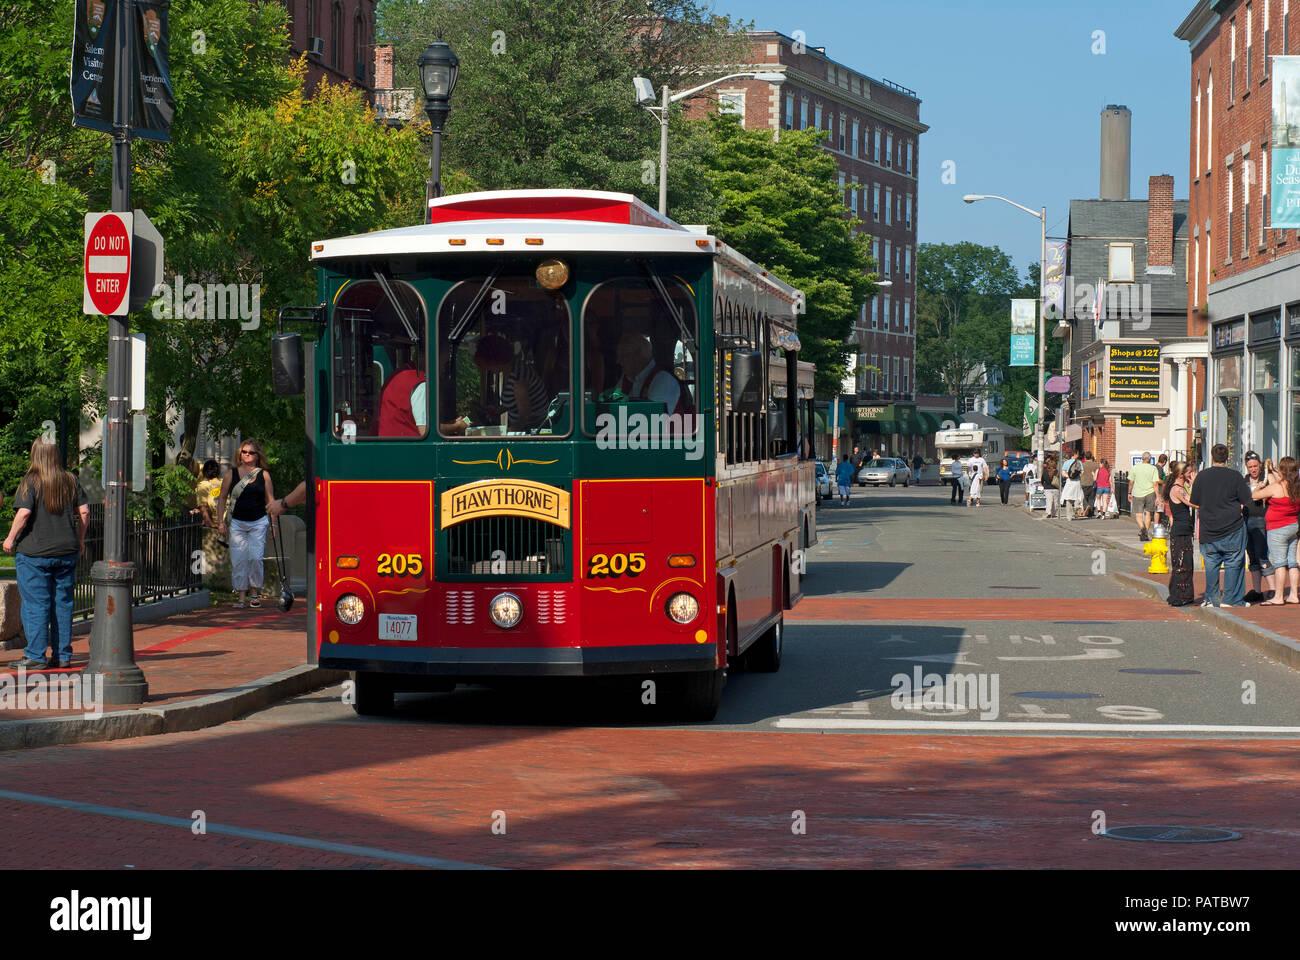 City tour bus in Salem, Essex County, Massachusetts, USA - Stock Image